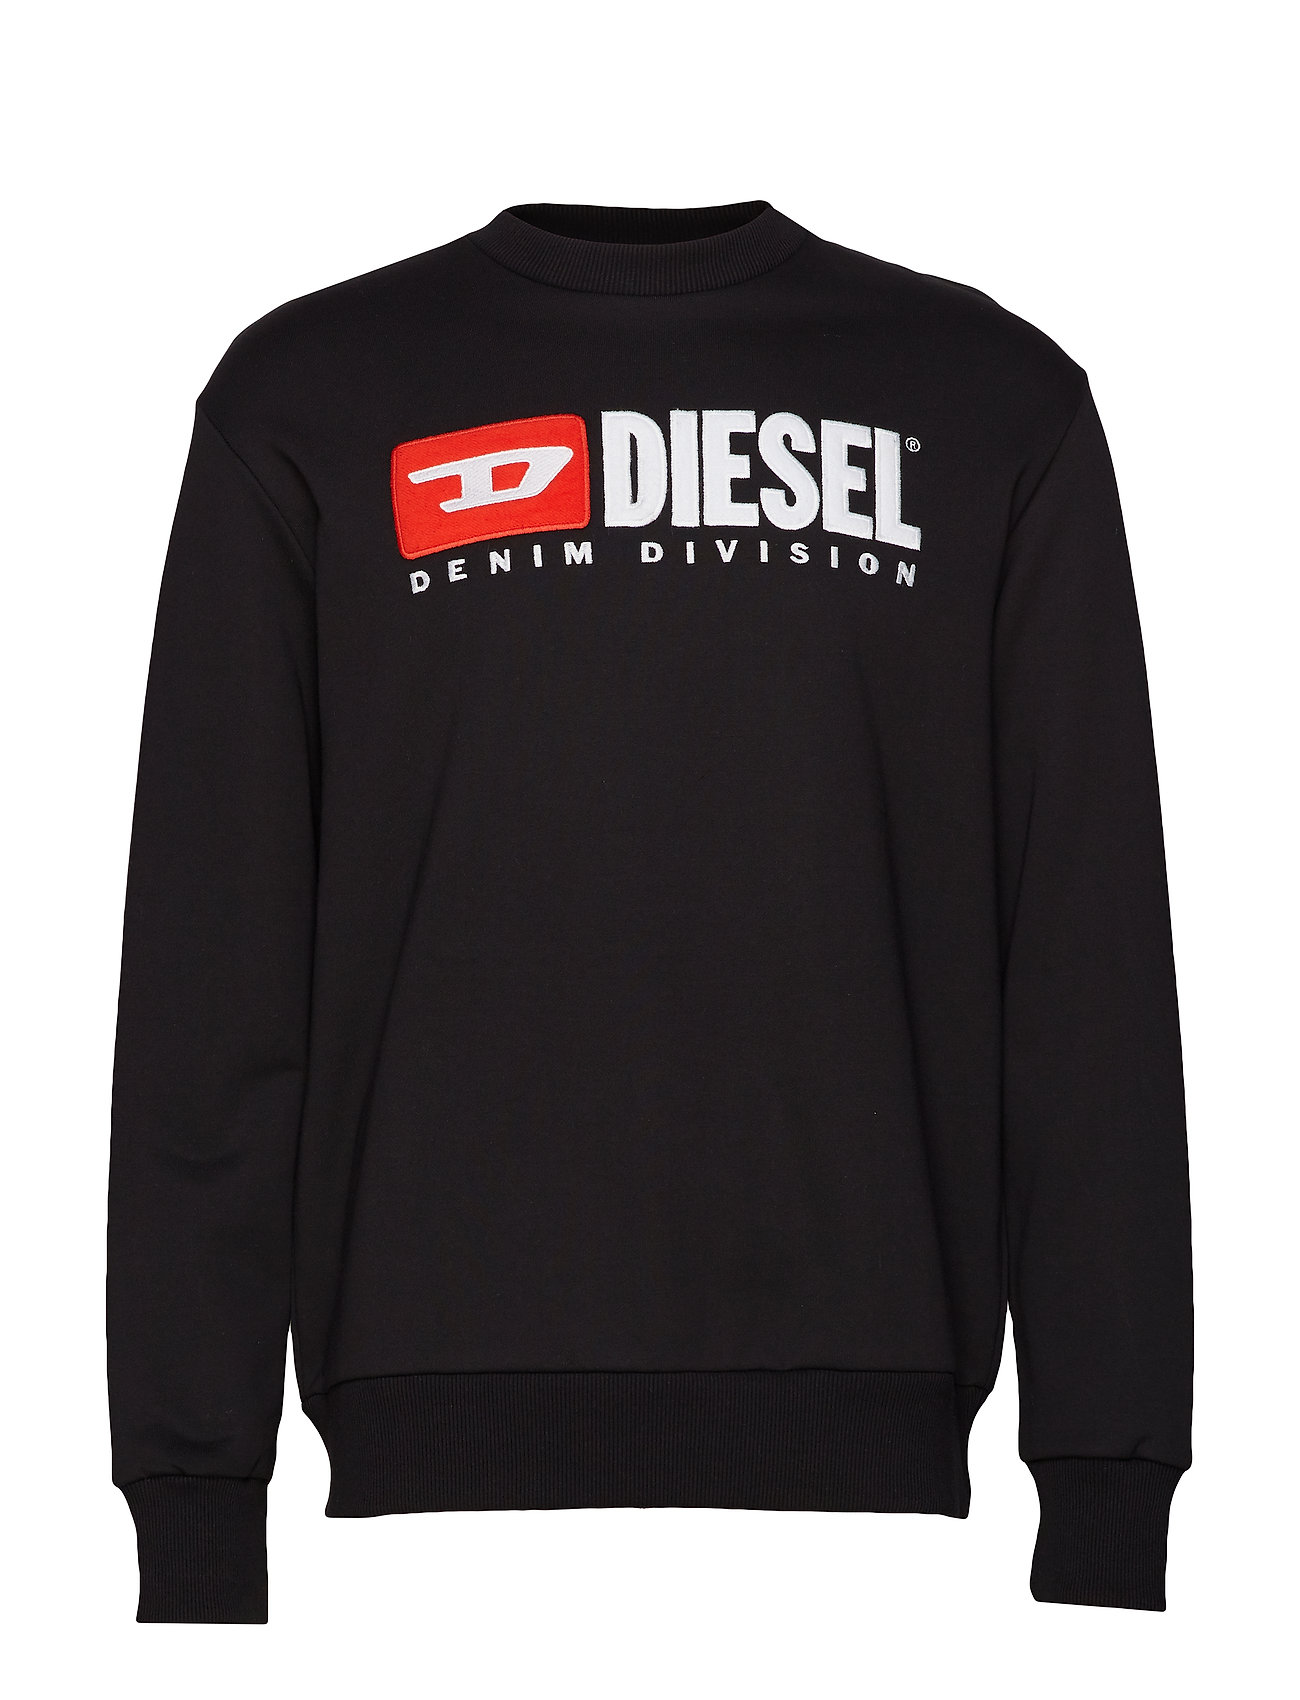 Diesel Men S-CREW-DIVISION SWEAT-SHIRT - BLACK